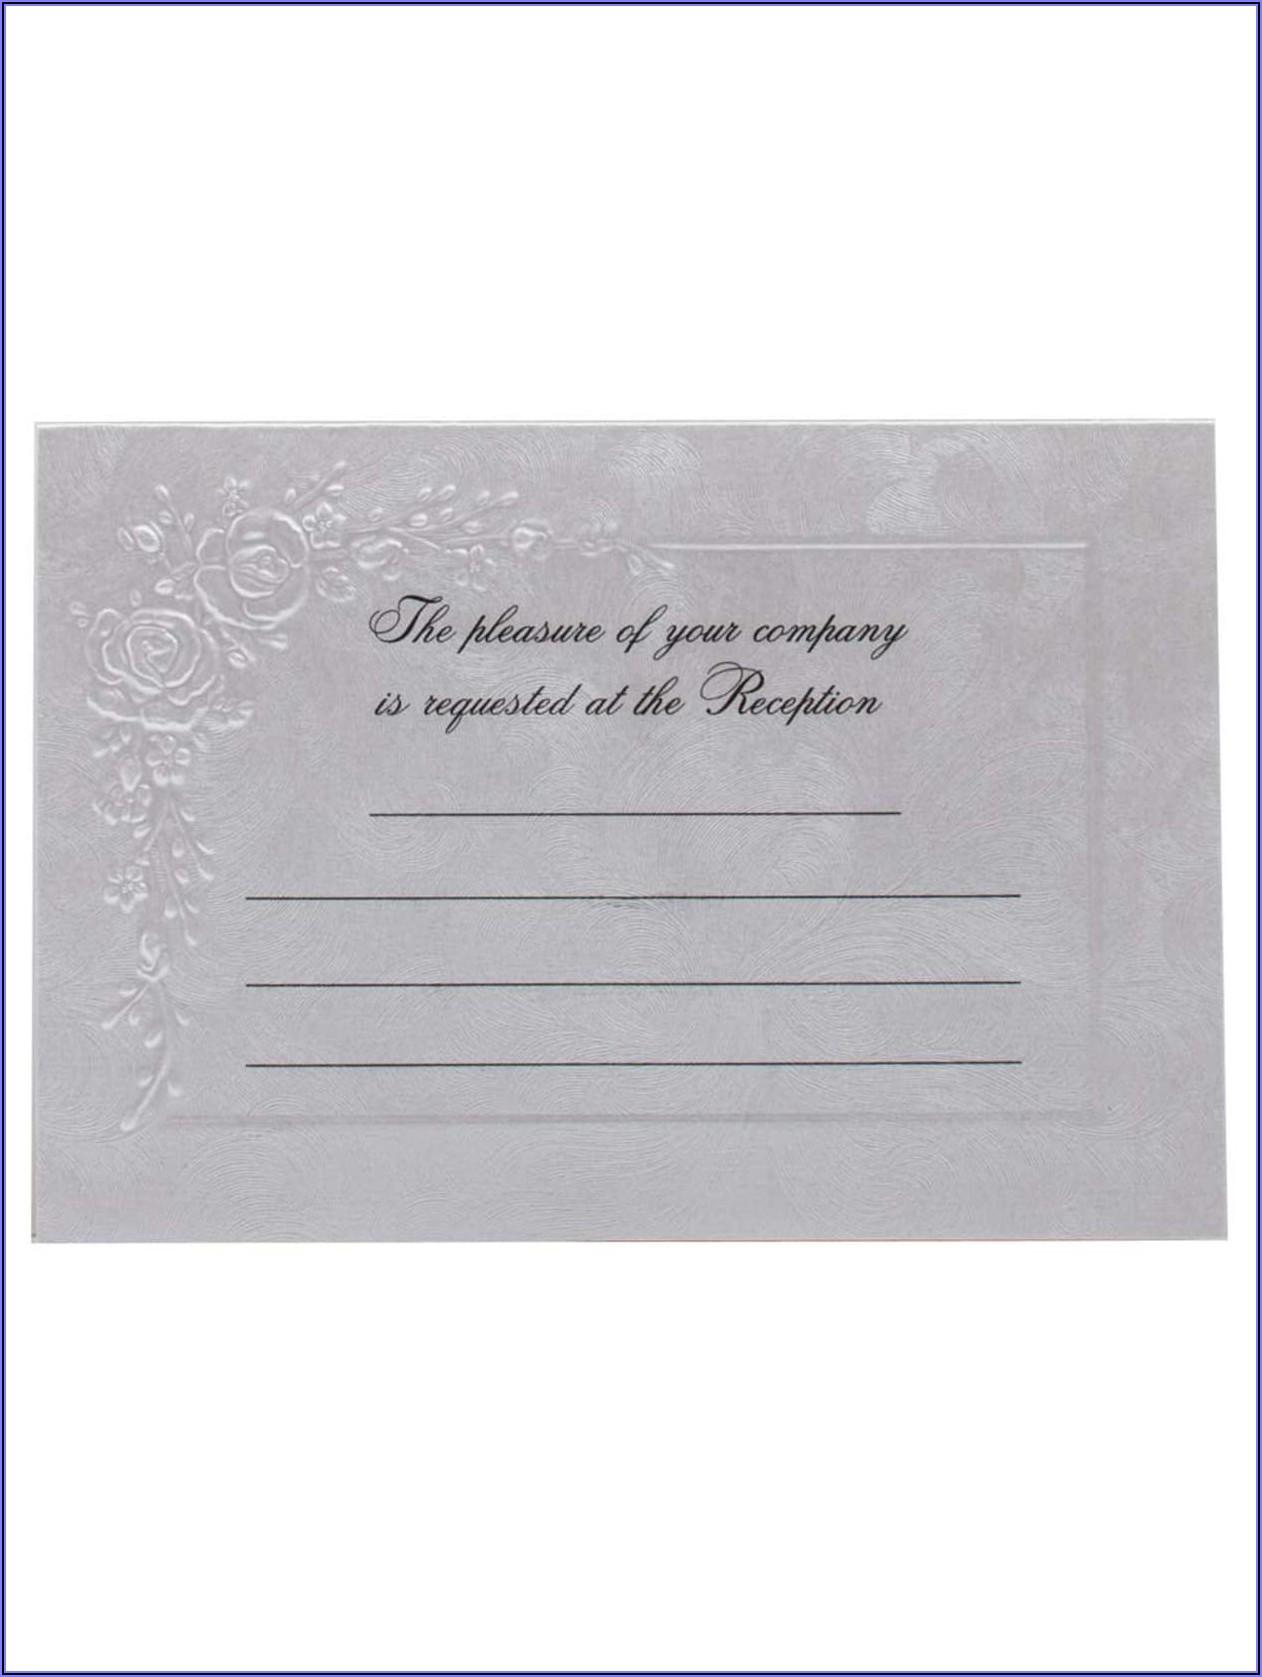 Does Office Depot Print Wedding Invitations